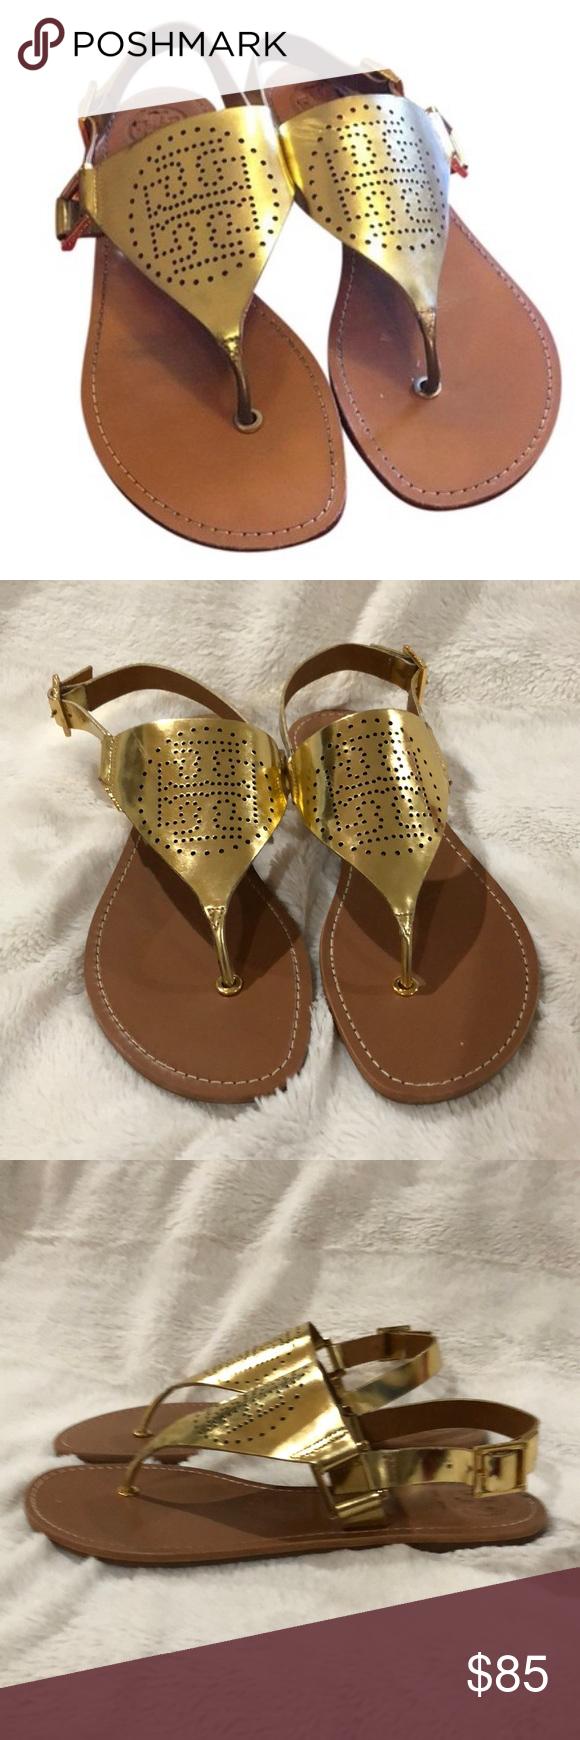 22e5f10b6f8aa NWT Tory Burch Daniela Sandals In Gold size 9.5 NWT and original box Tory  Burch Sandals